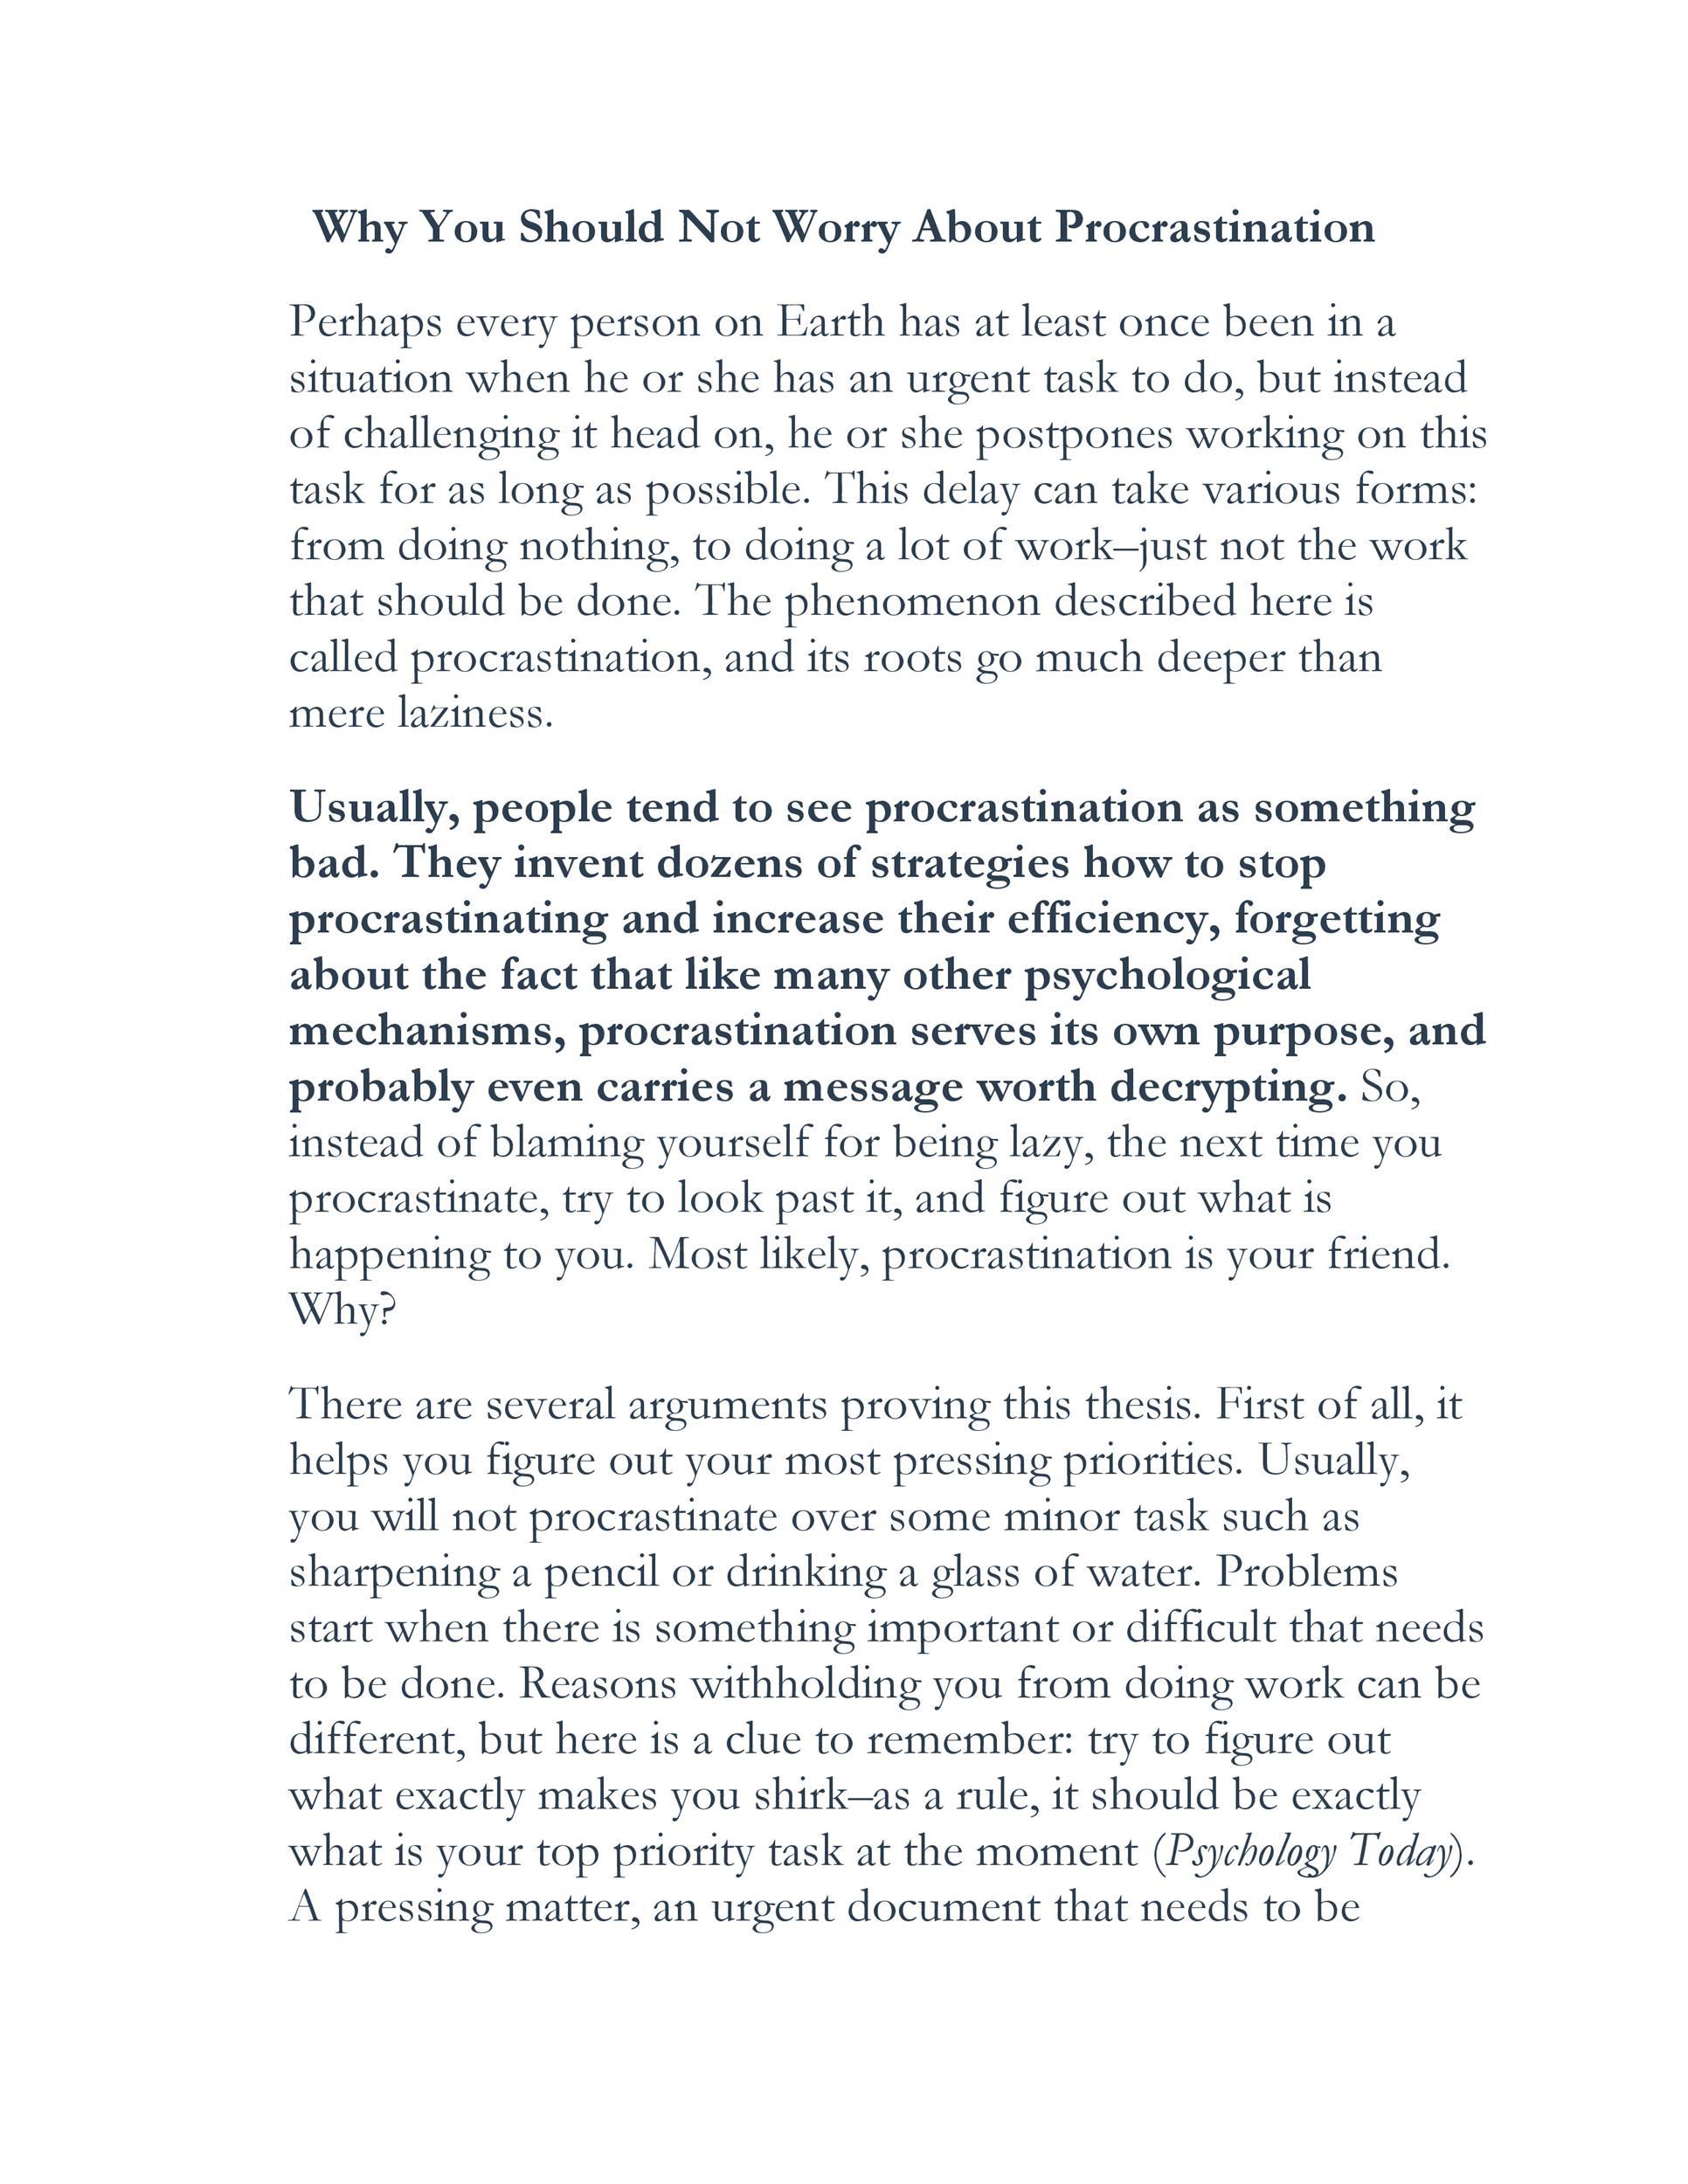 Free persuasive essay example 45